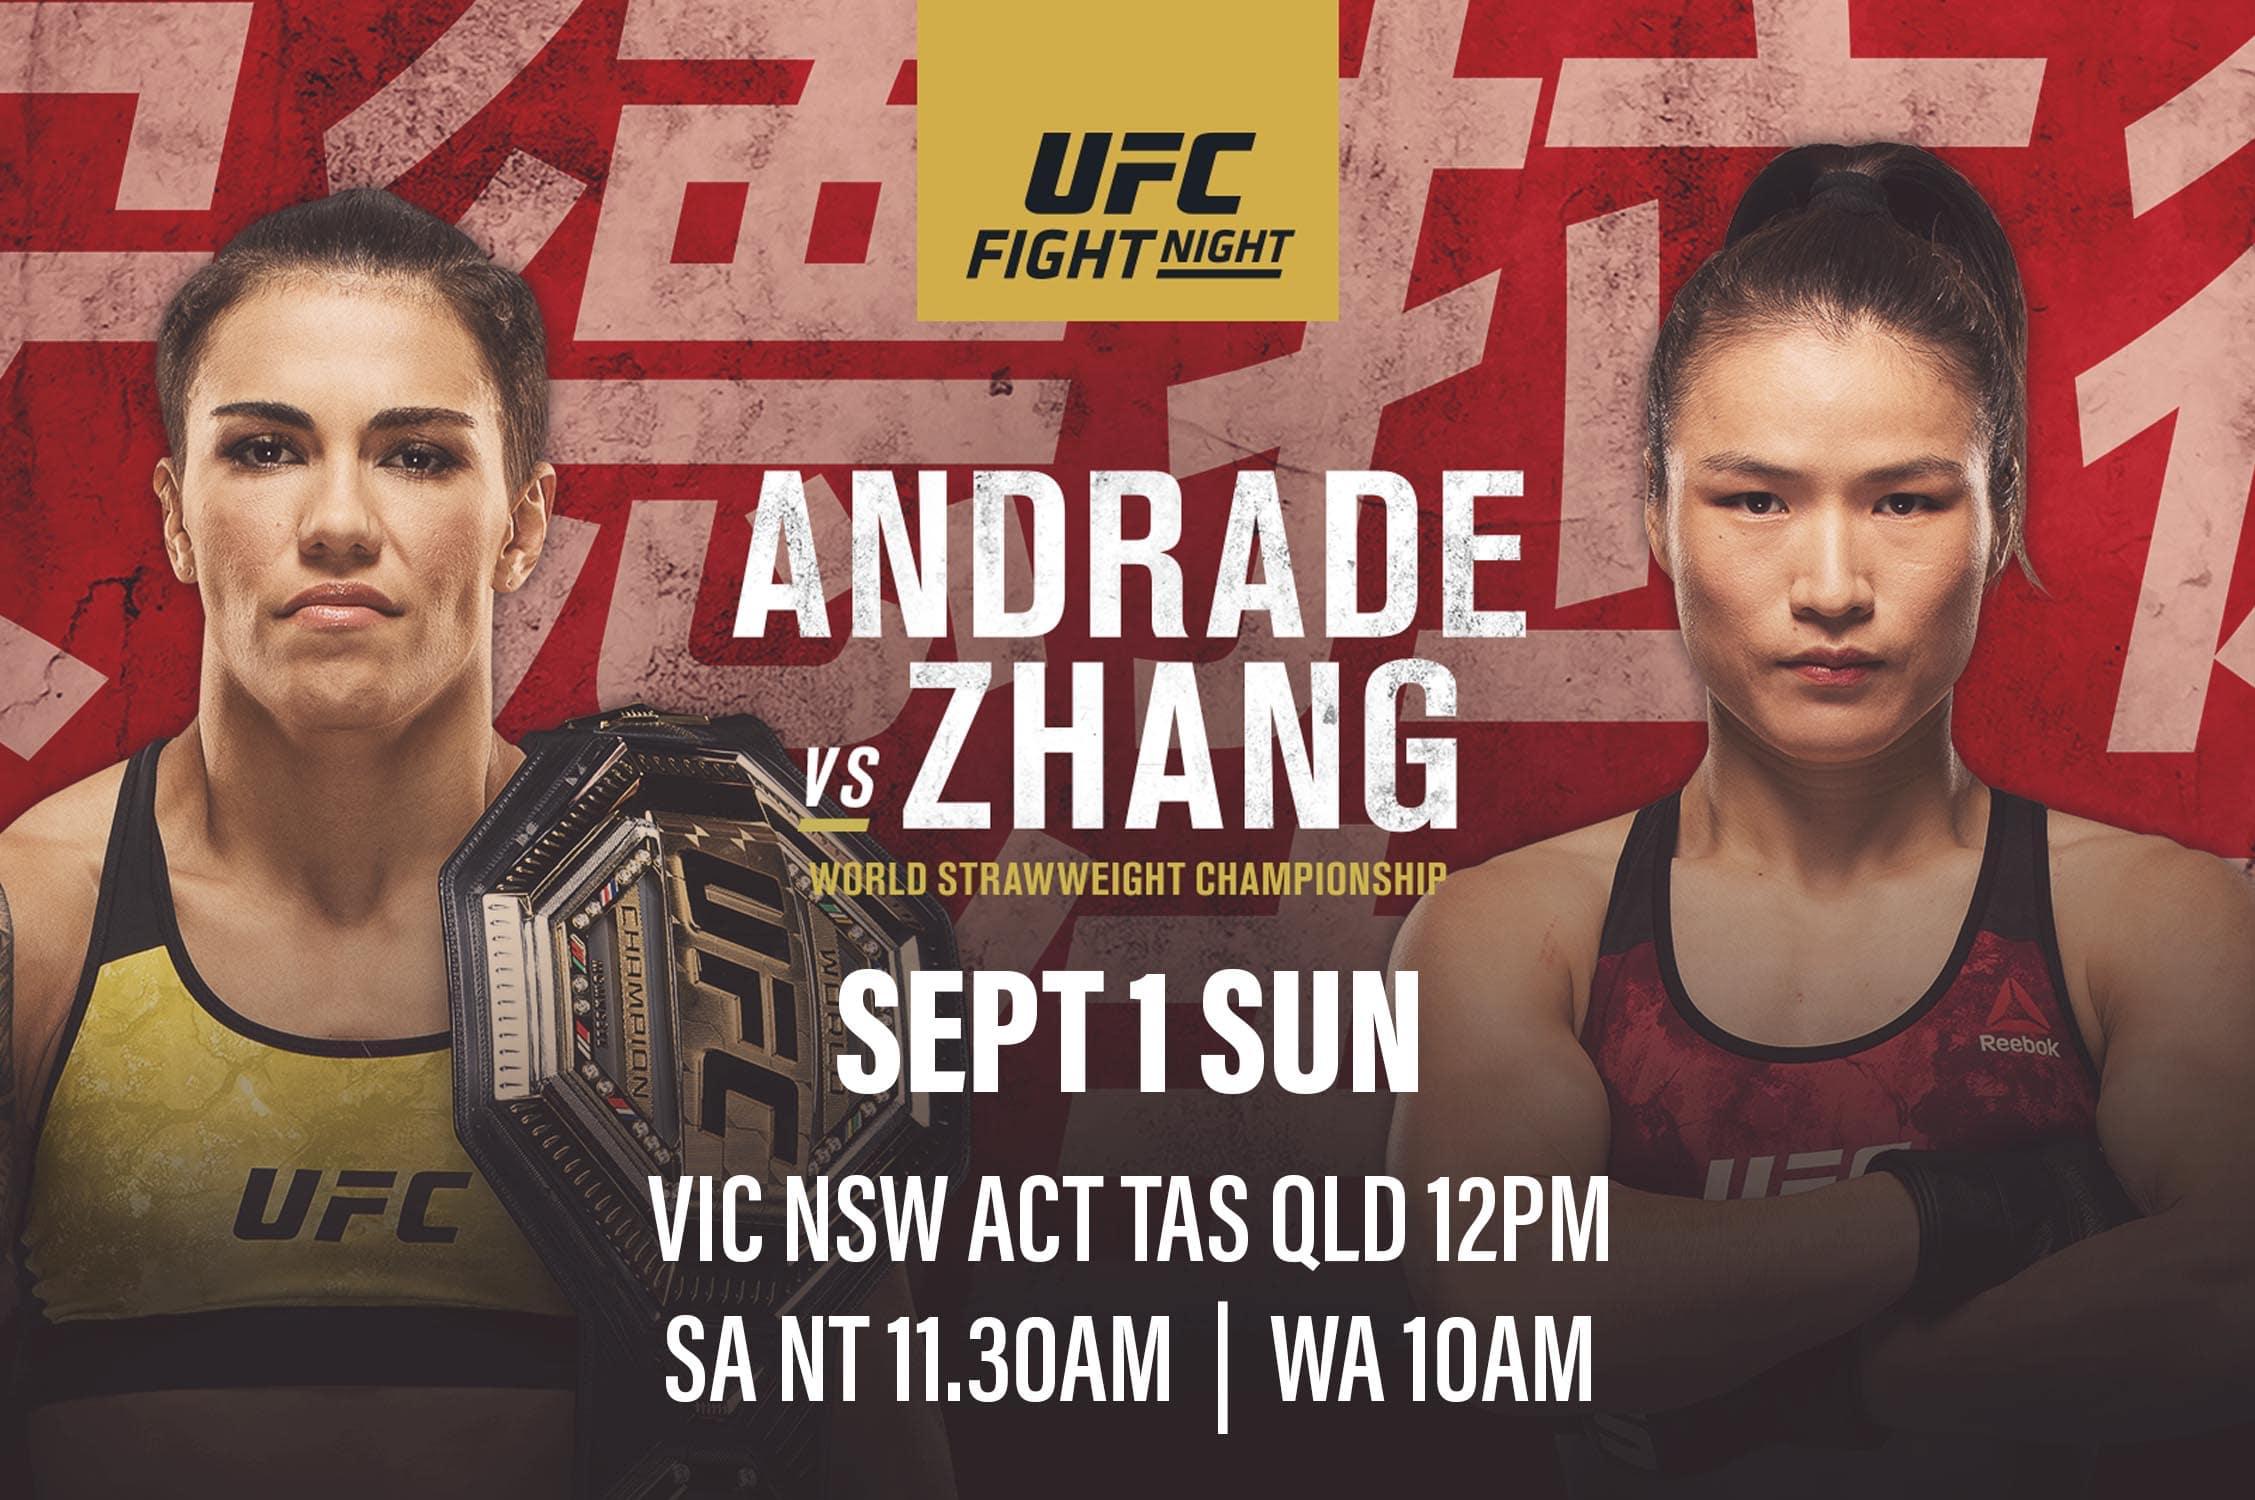 UFC Fight Night_Andrade vs Zhang_Sept 1_BATP-min (1).jpg